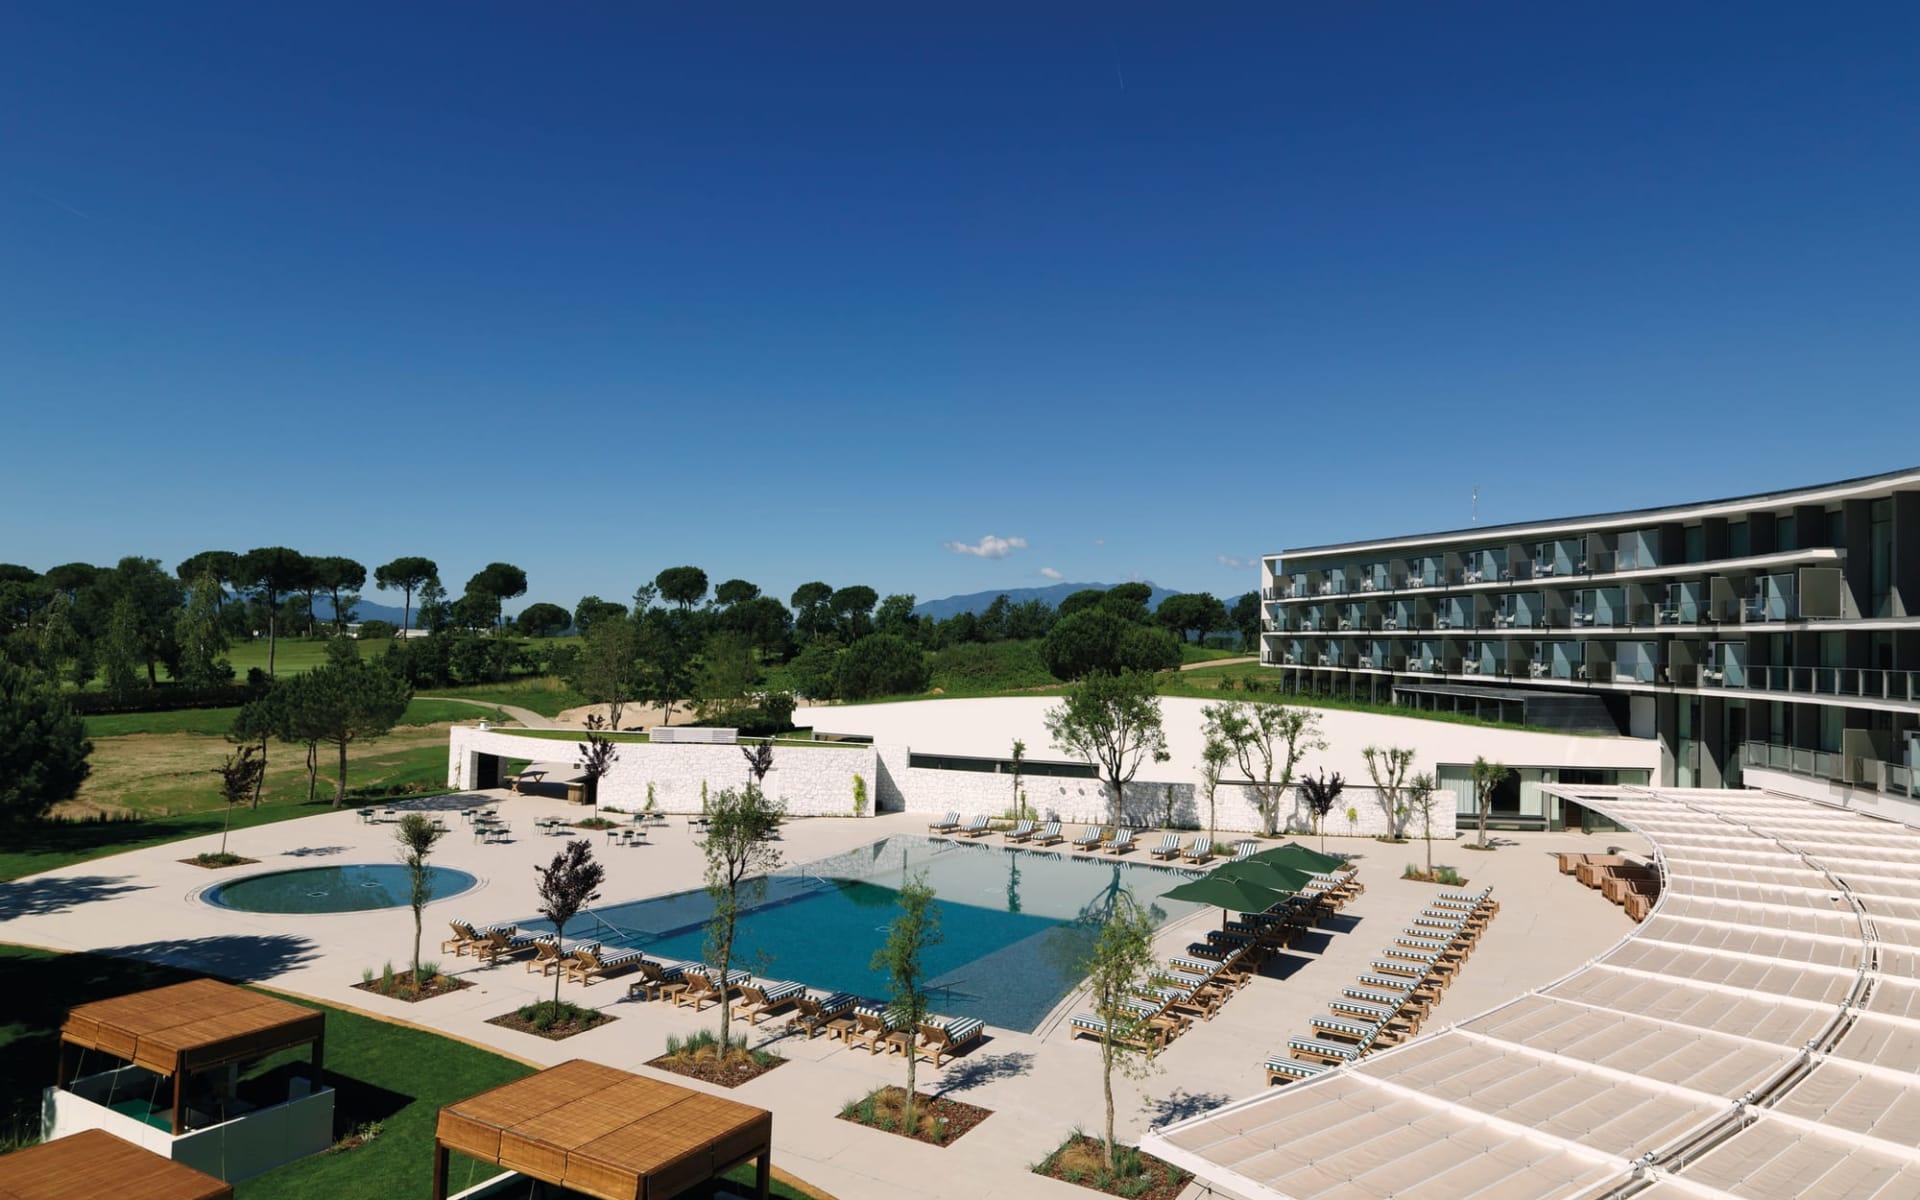 PGA Catalunya Resort - Hotel Camiral in Costa Brava: PGA Catalunya Resort - Hotel Camiral - Blick auf gesamte Poolanlage und Umgebung